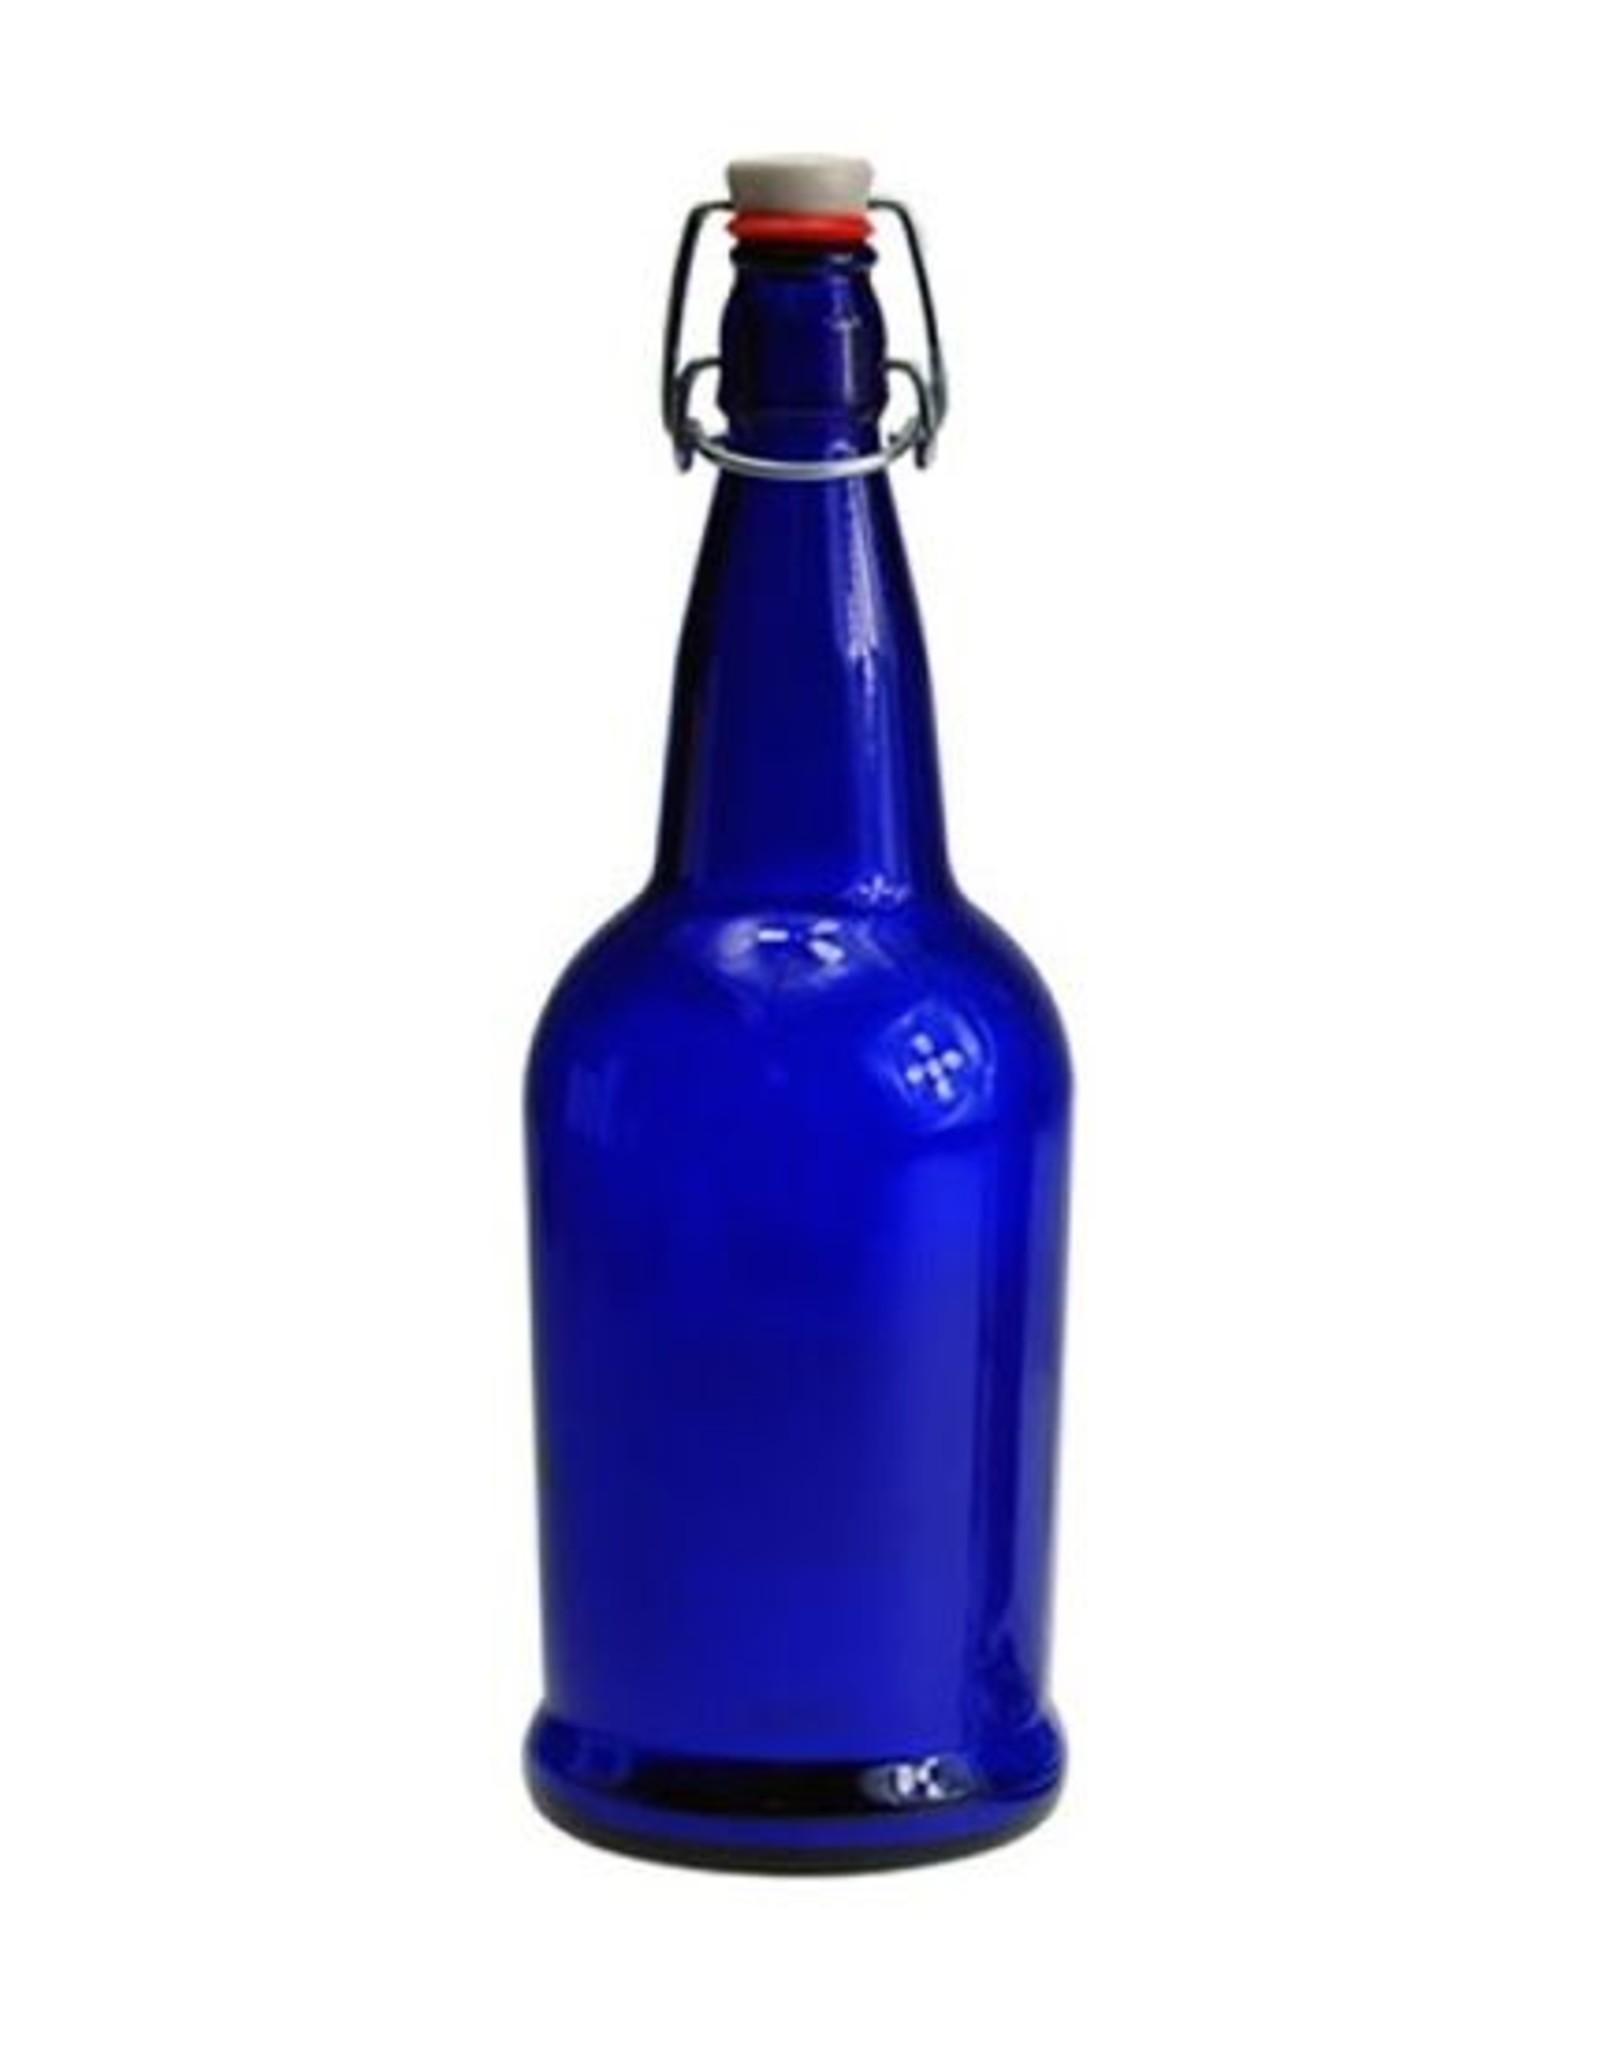 EZ cap EZ-CAP BOTTLES  16 oz. COBALT BLUE (FLIP TOP)